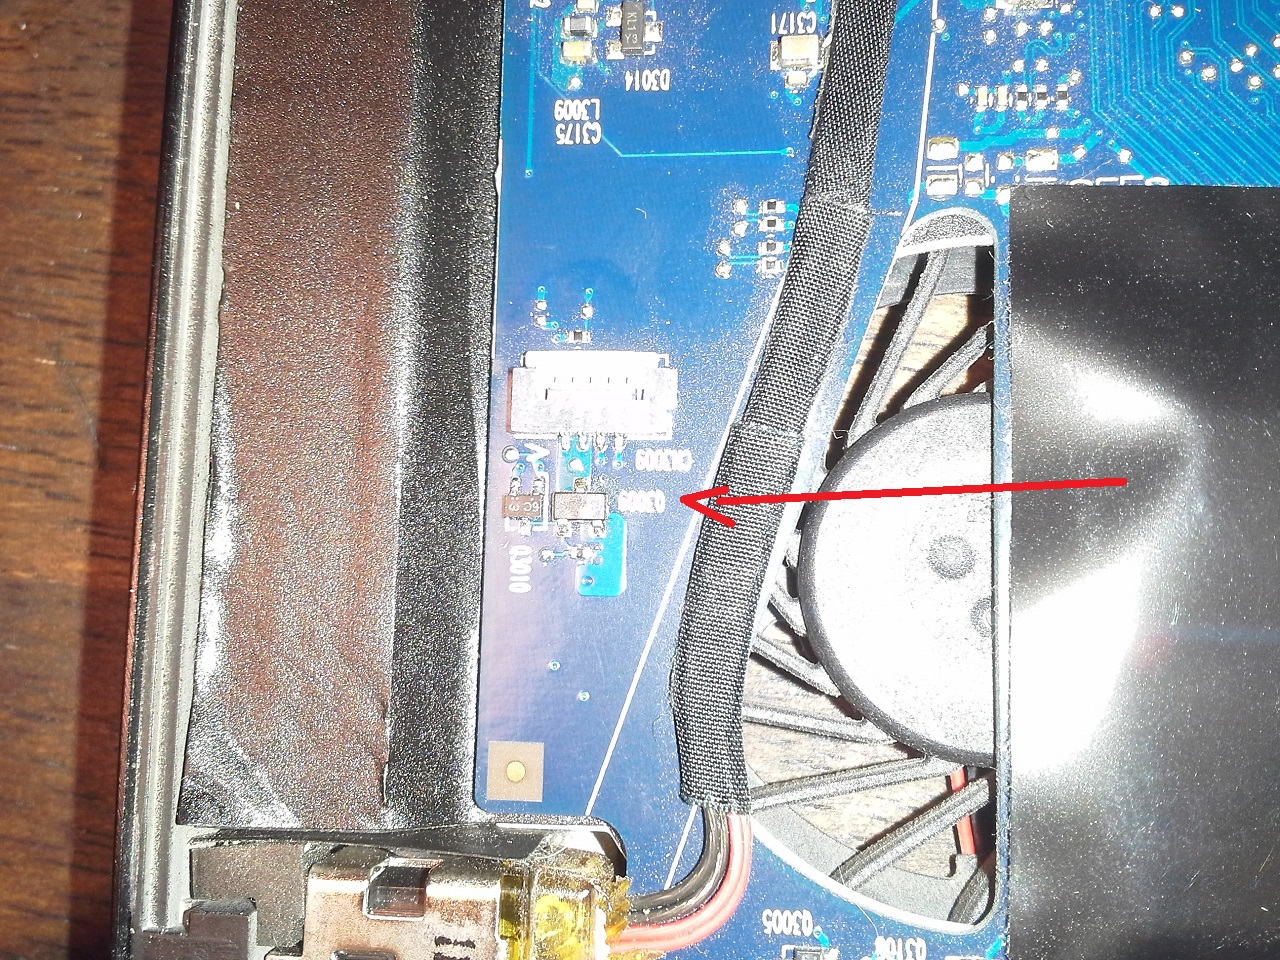 Keyboard Backlight Led Driver Circuit Power Transistor Ident Hp 2014 02 06 2140352